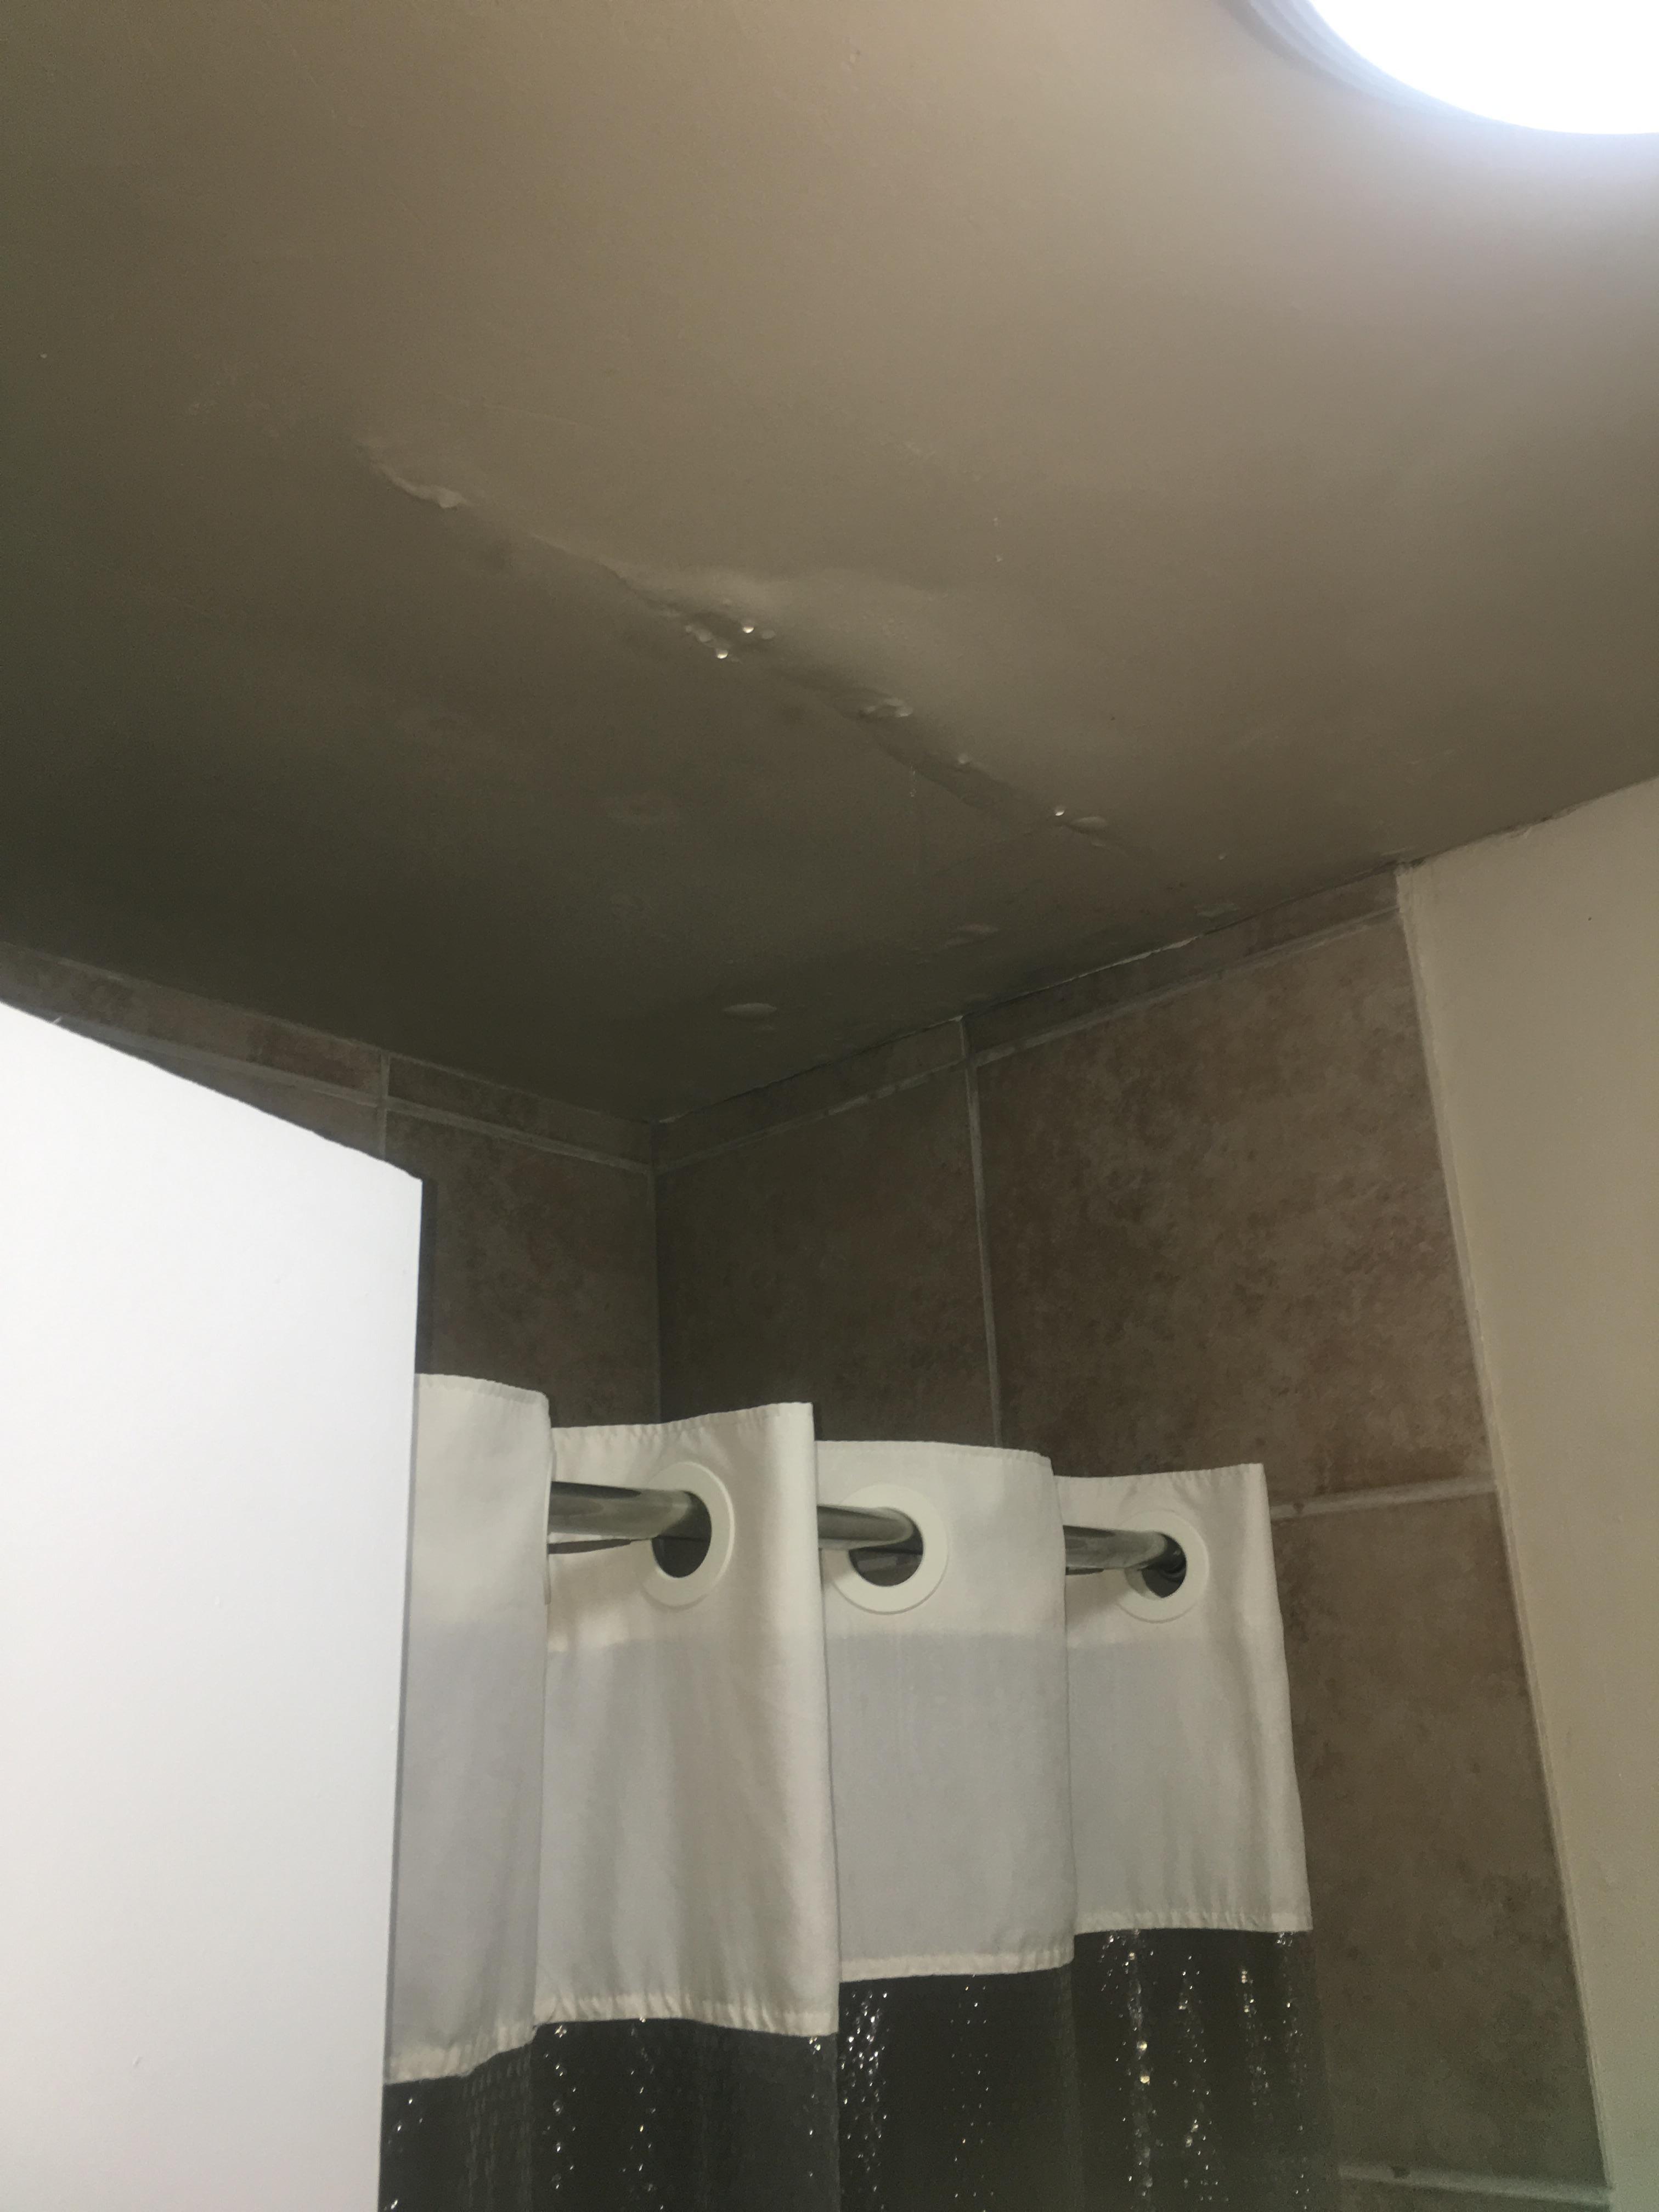 Several leak